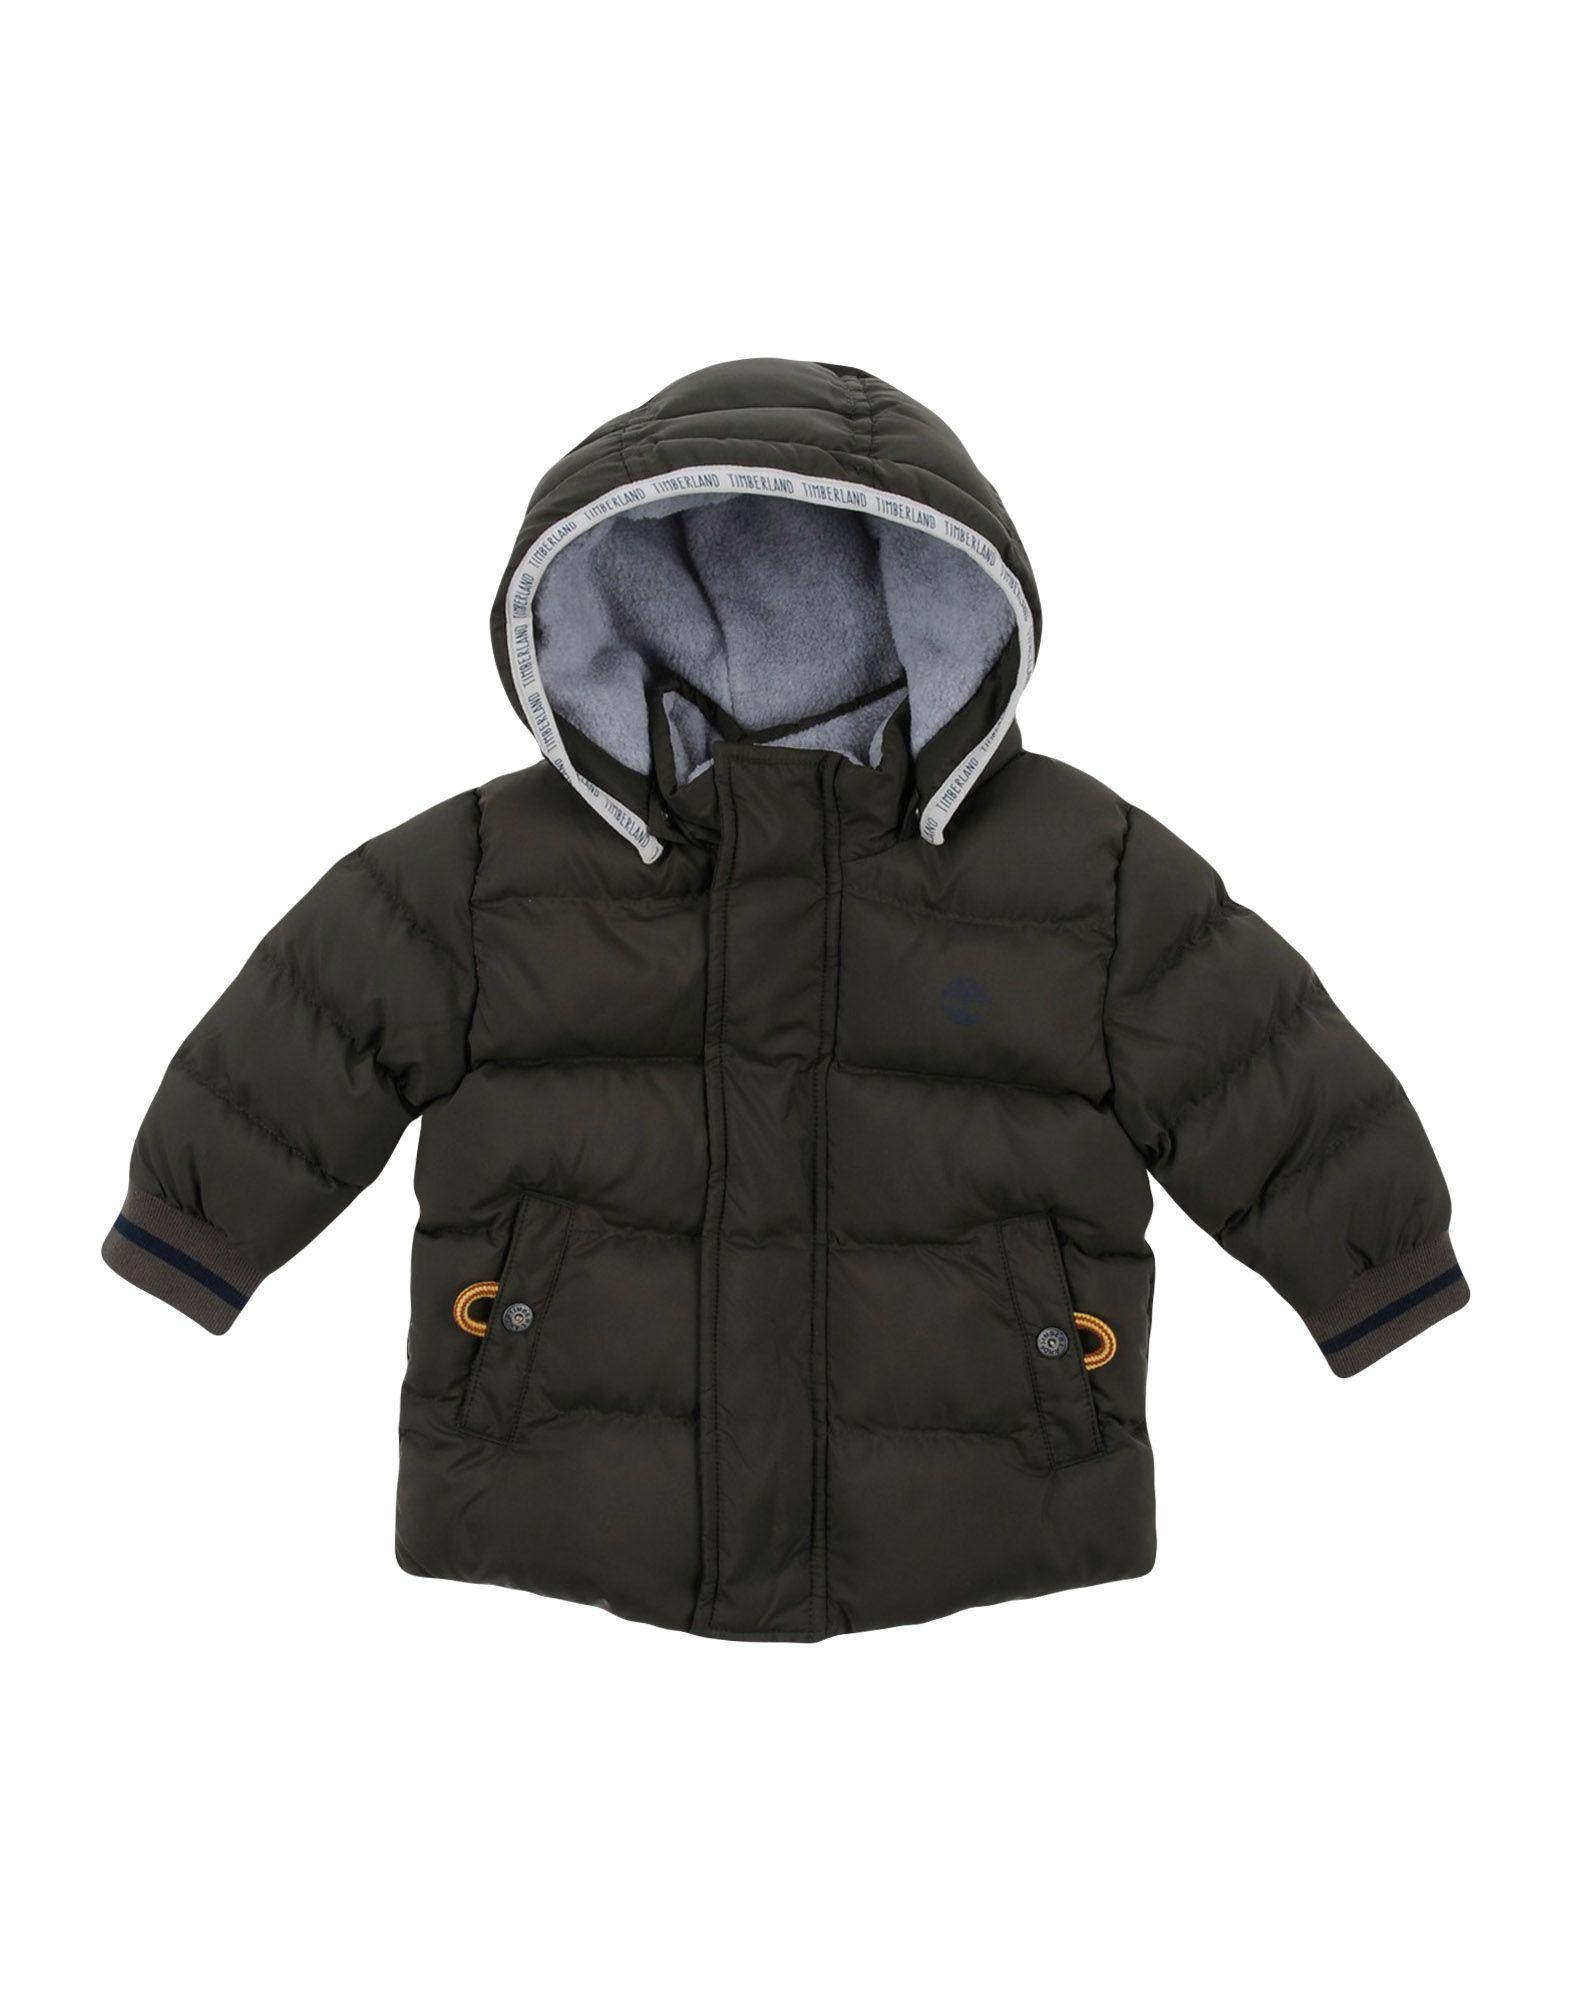 Timberland - Coats & Jackets - Synthetic Down Jackets - On Yoox.com